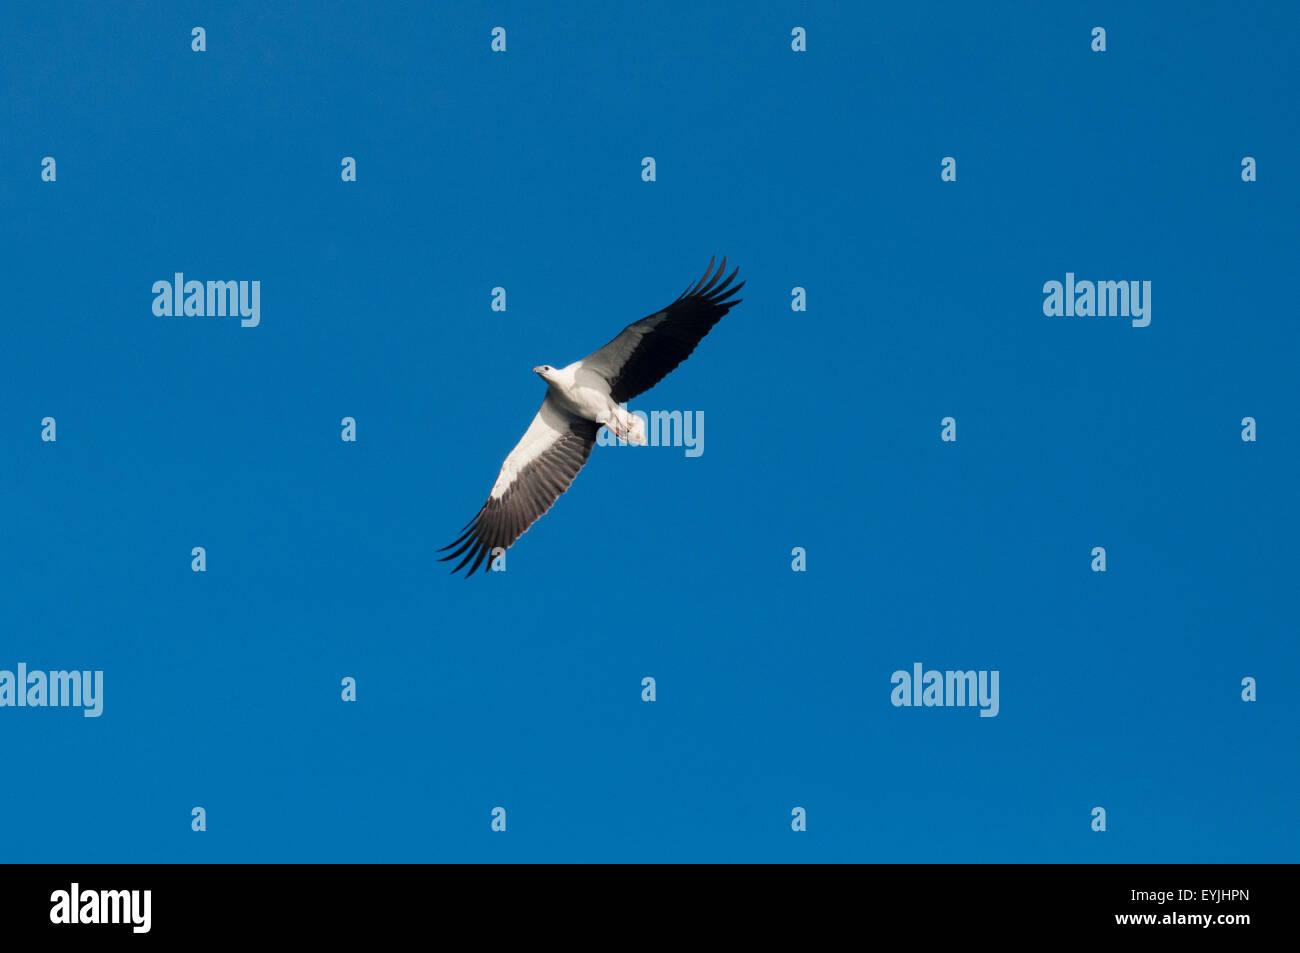 White bellied sea eagle, Haliaeetus leucogaster, soaring above Komodo National Park, Indonesia Stock Photo